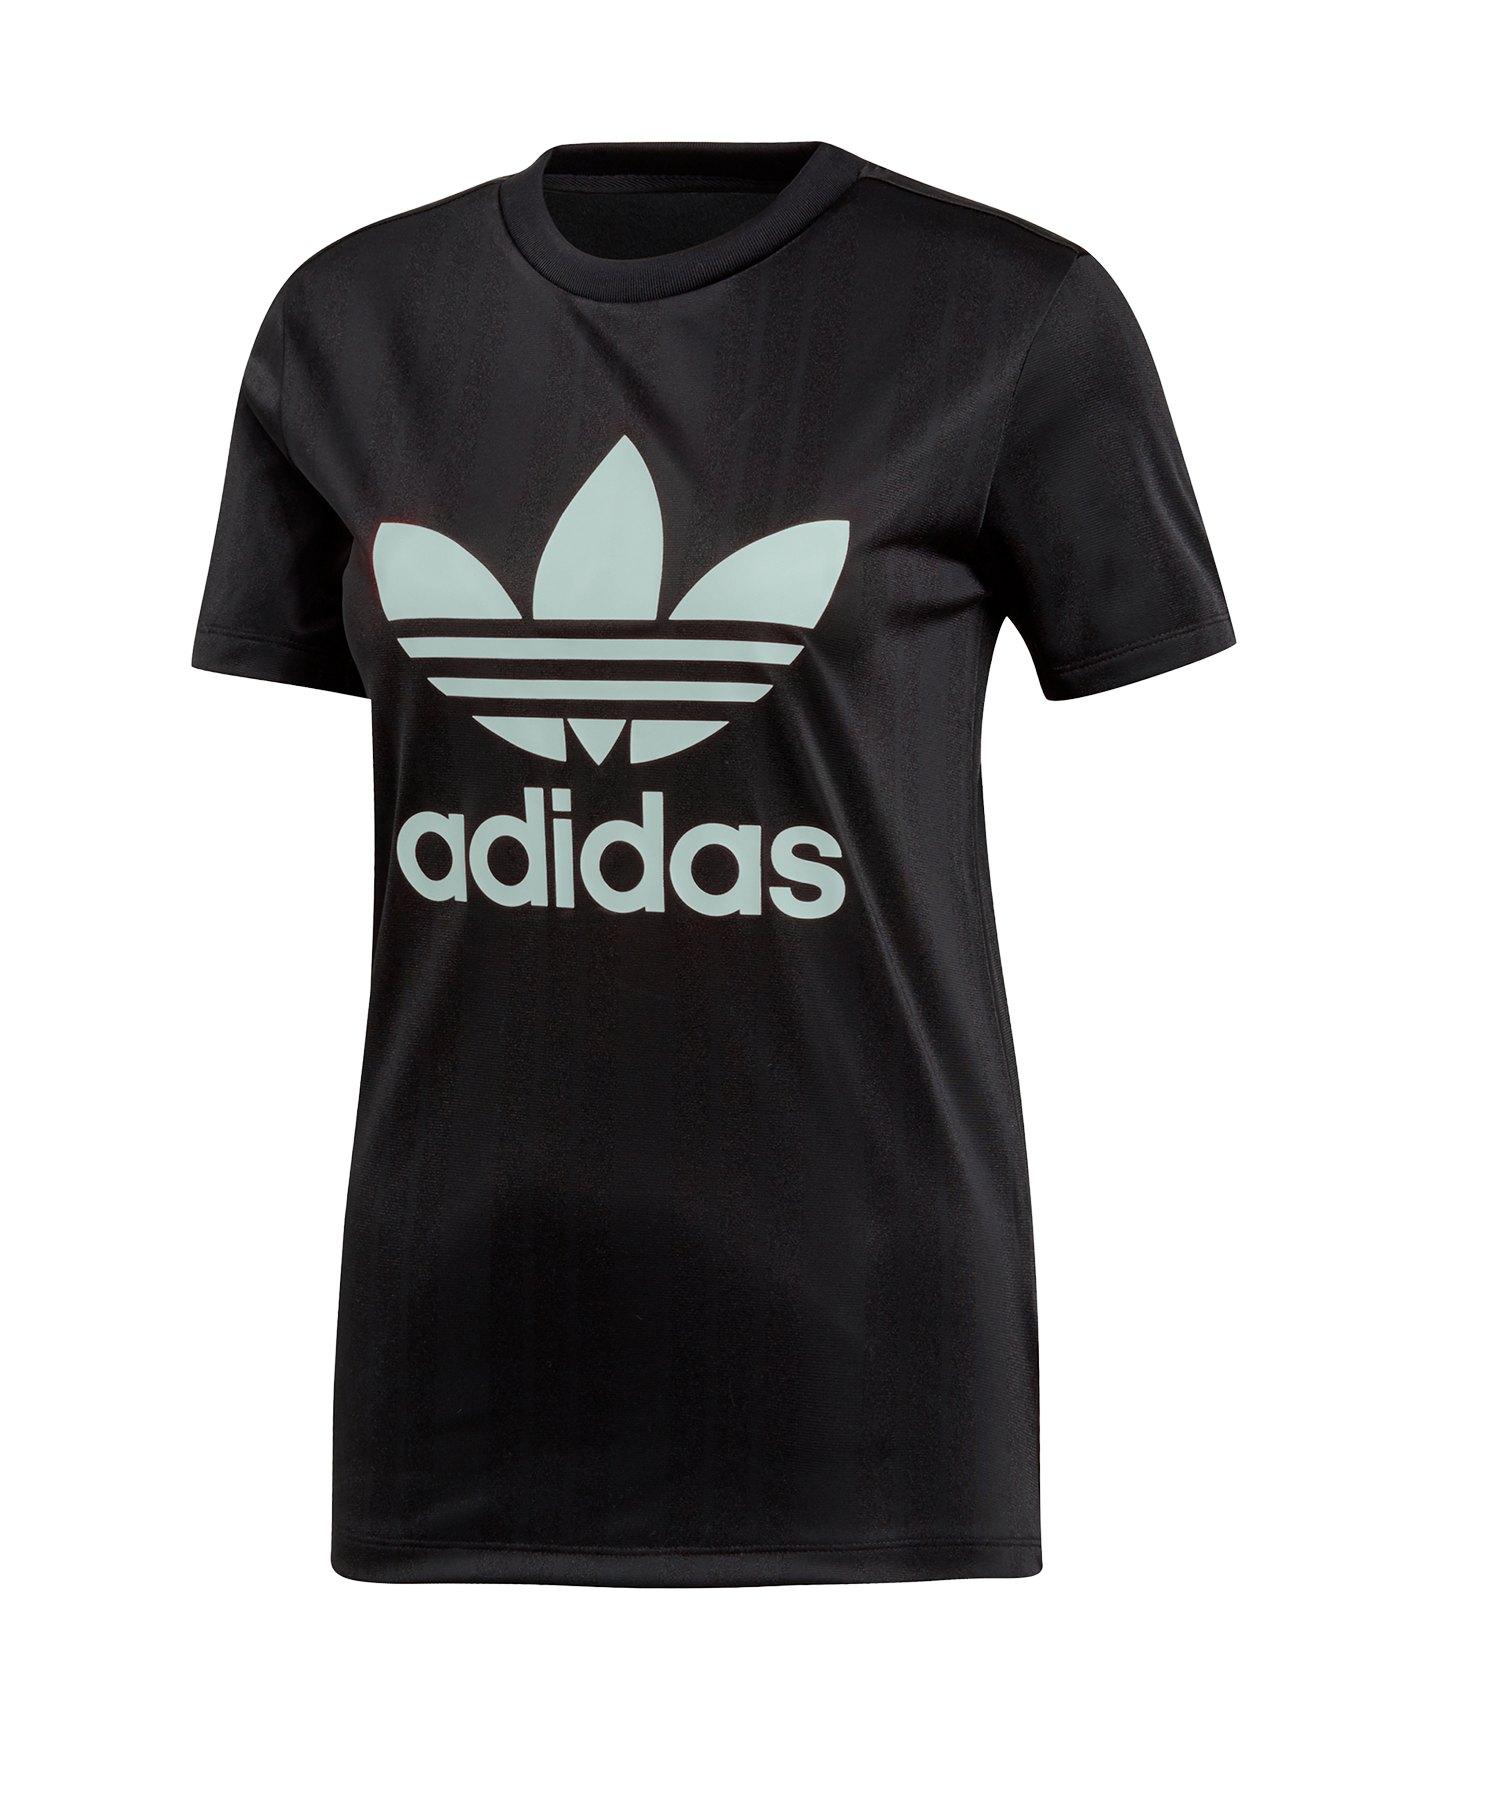 adidas Originals Trefoil Tee T Shirt Damen Schwarz